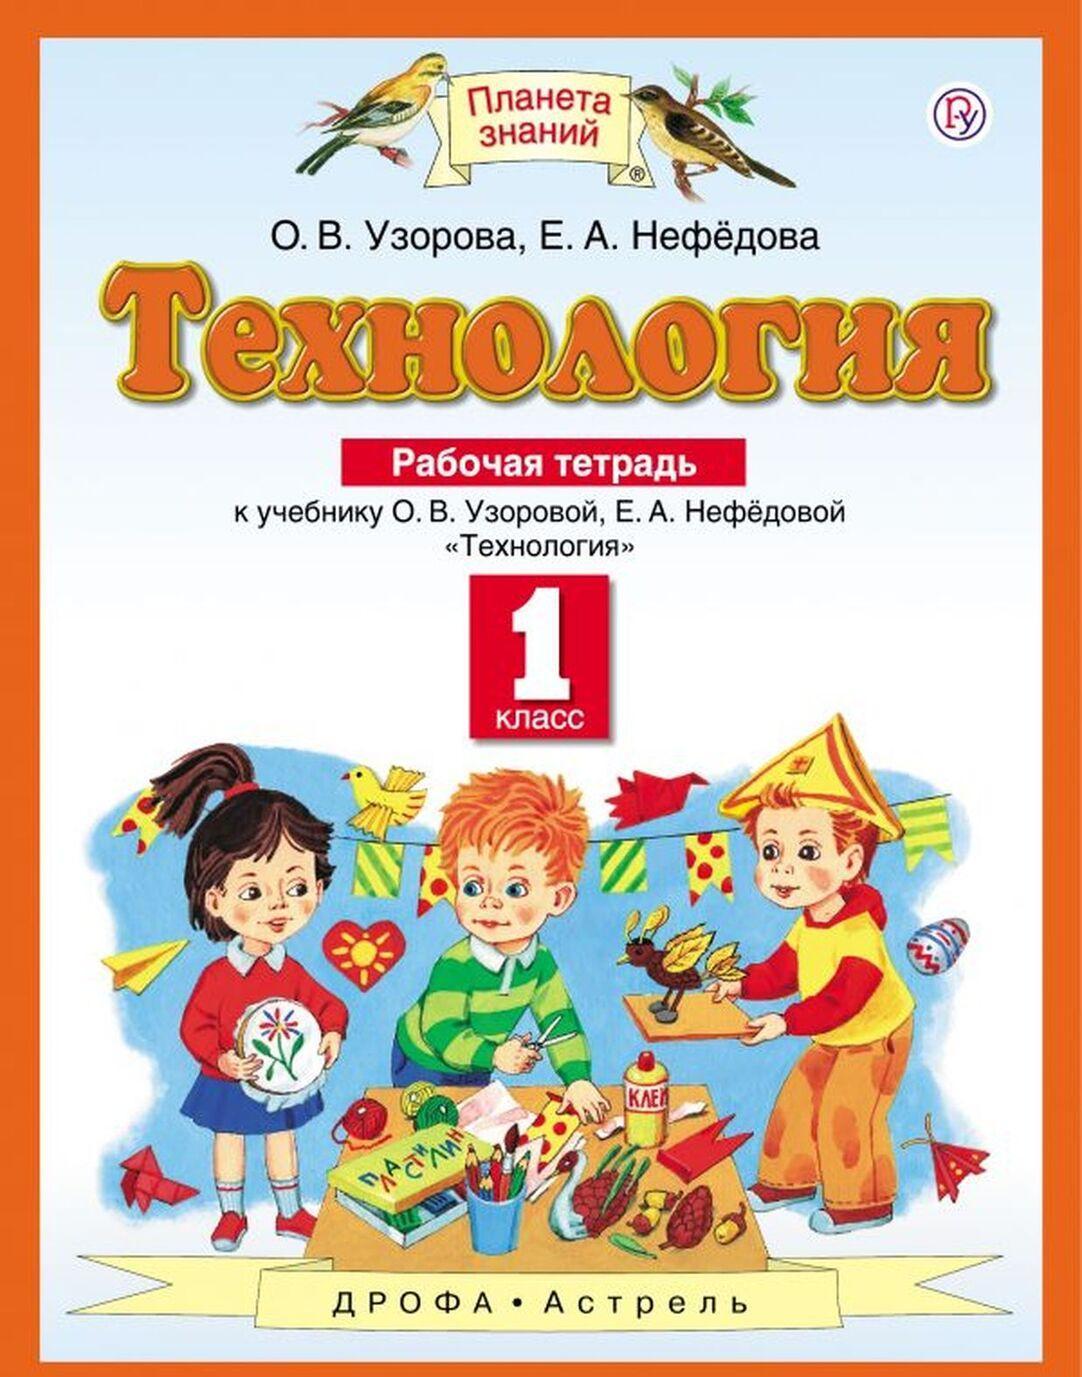 Tekhnologija. 1 klass. Rabochaja tetrad. K uchebniku O. V. Uzorovoj, E. A. Nefedovoj